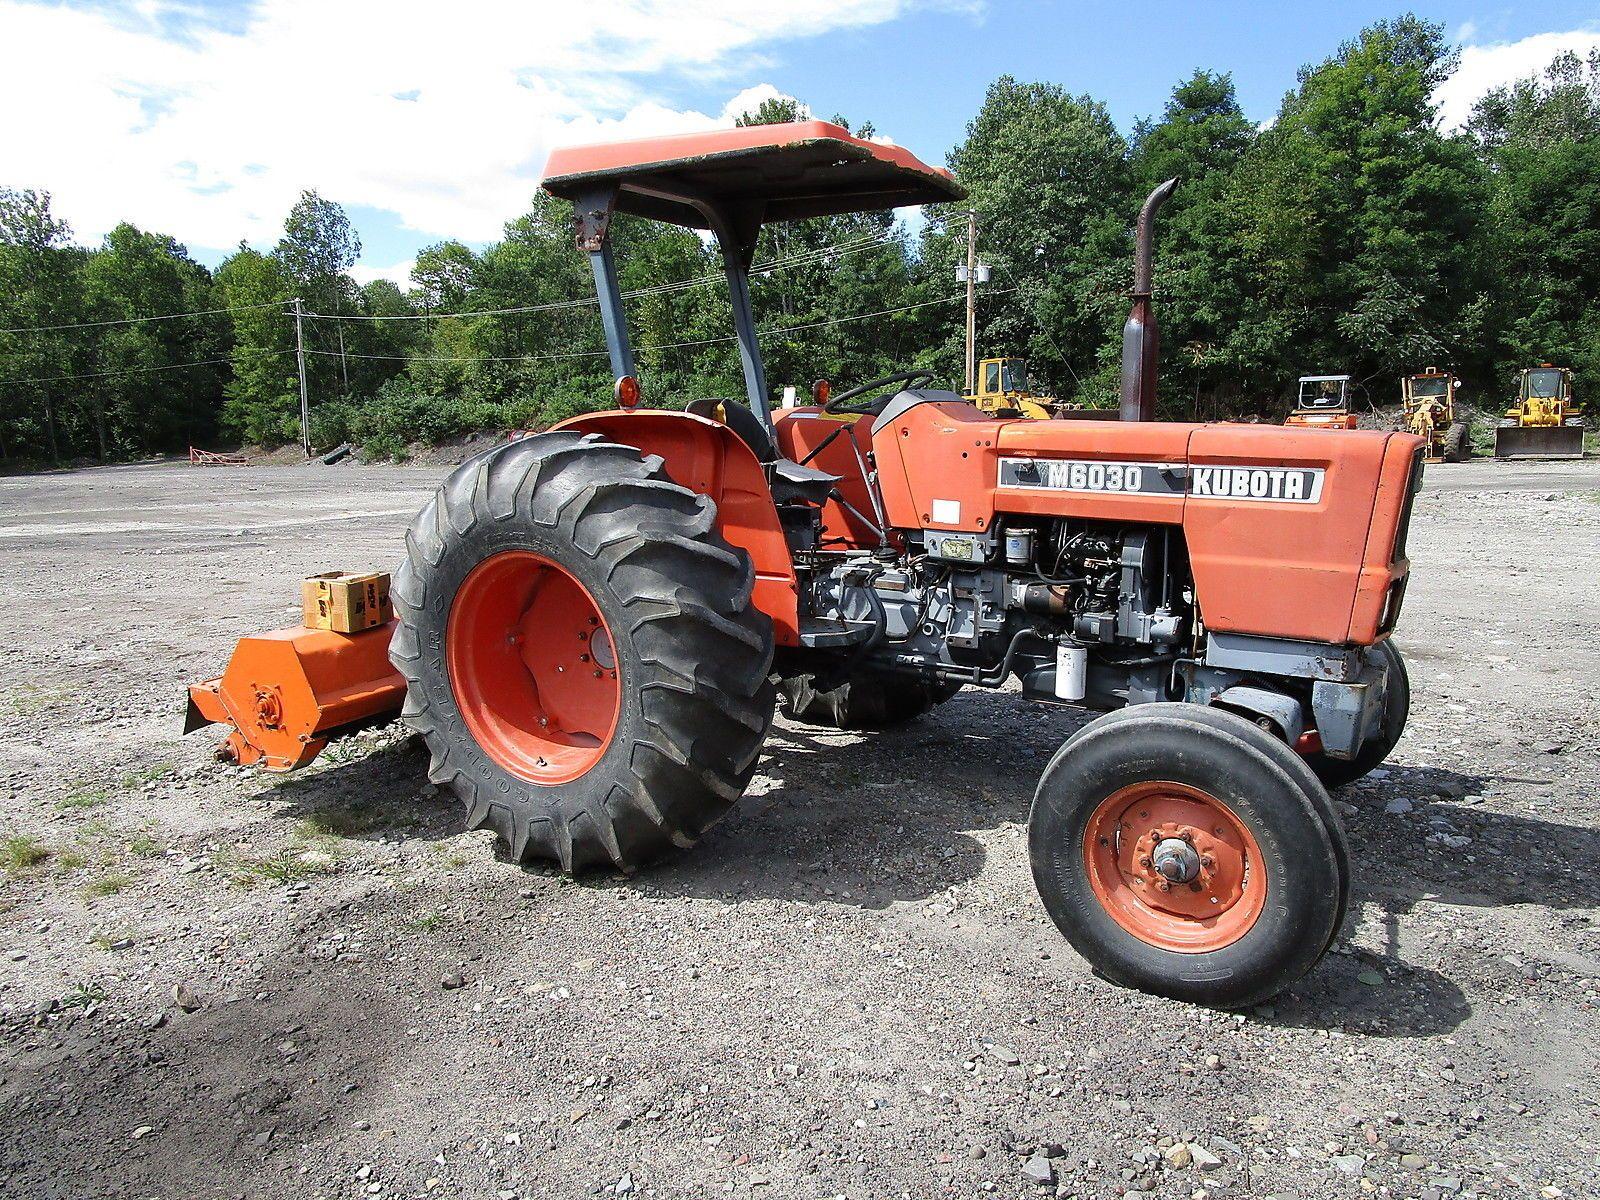 Kubota L245 Tractor Wiring Electrical Diagrams L175 Diagram L2350 Free Download Bucket